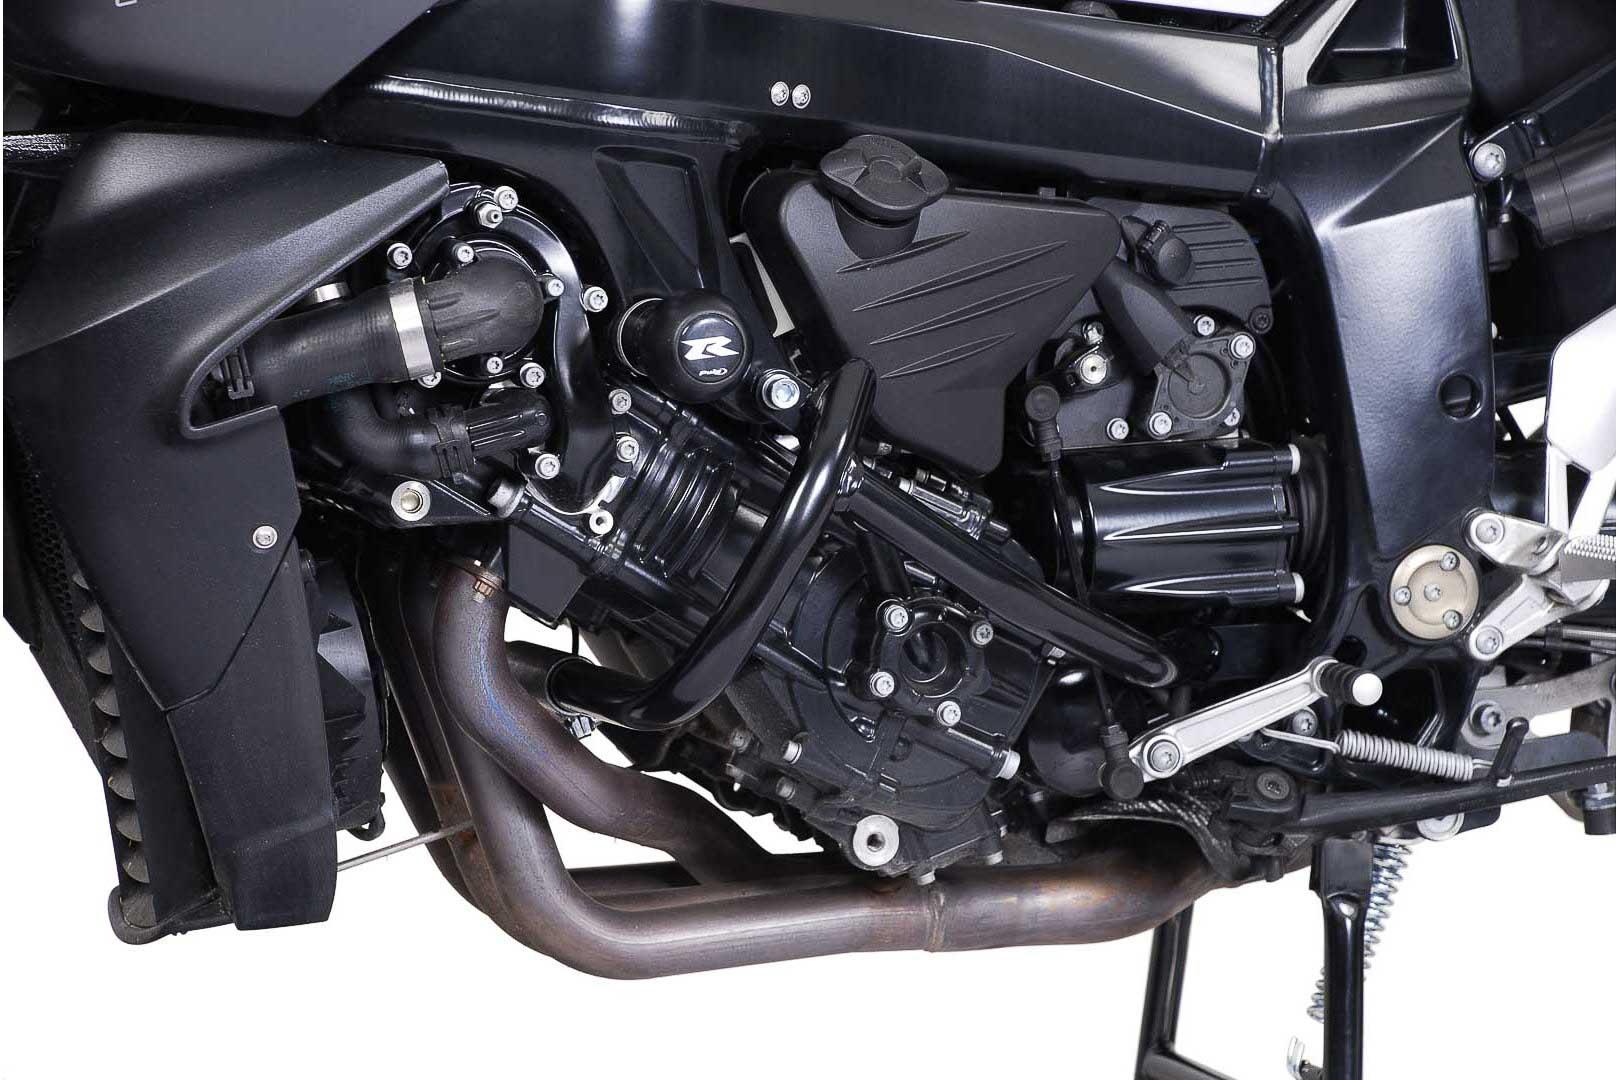 SW-Motech Moottorinsuojarauta BMW K1200R/K1300R musta